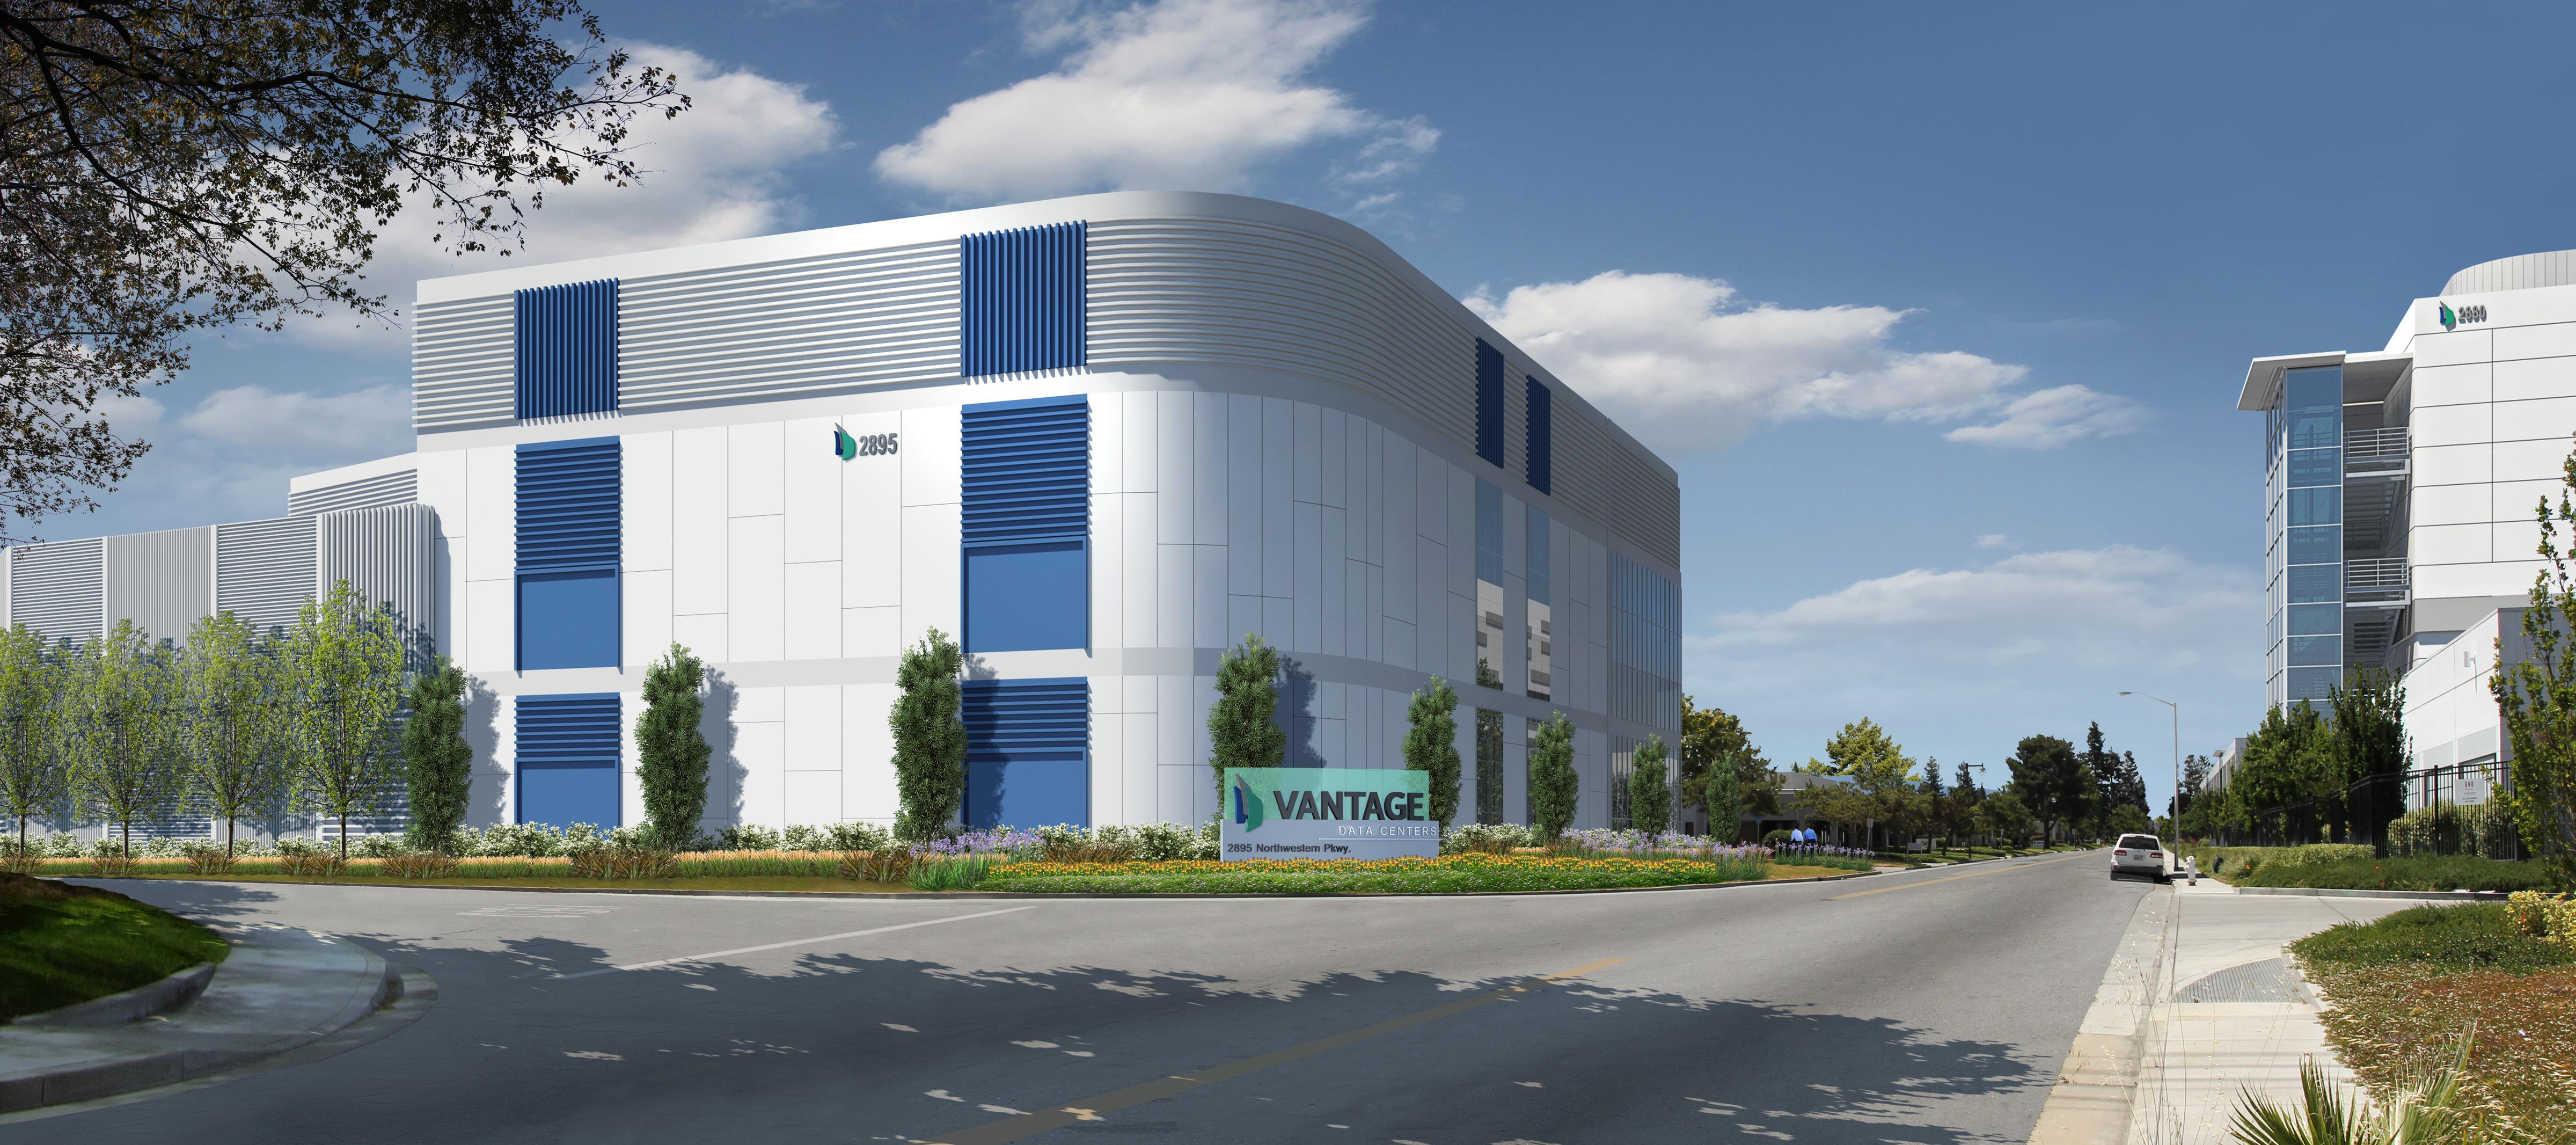 Rendering of Vantage's V6 facility